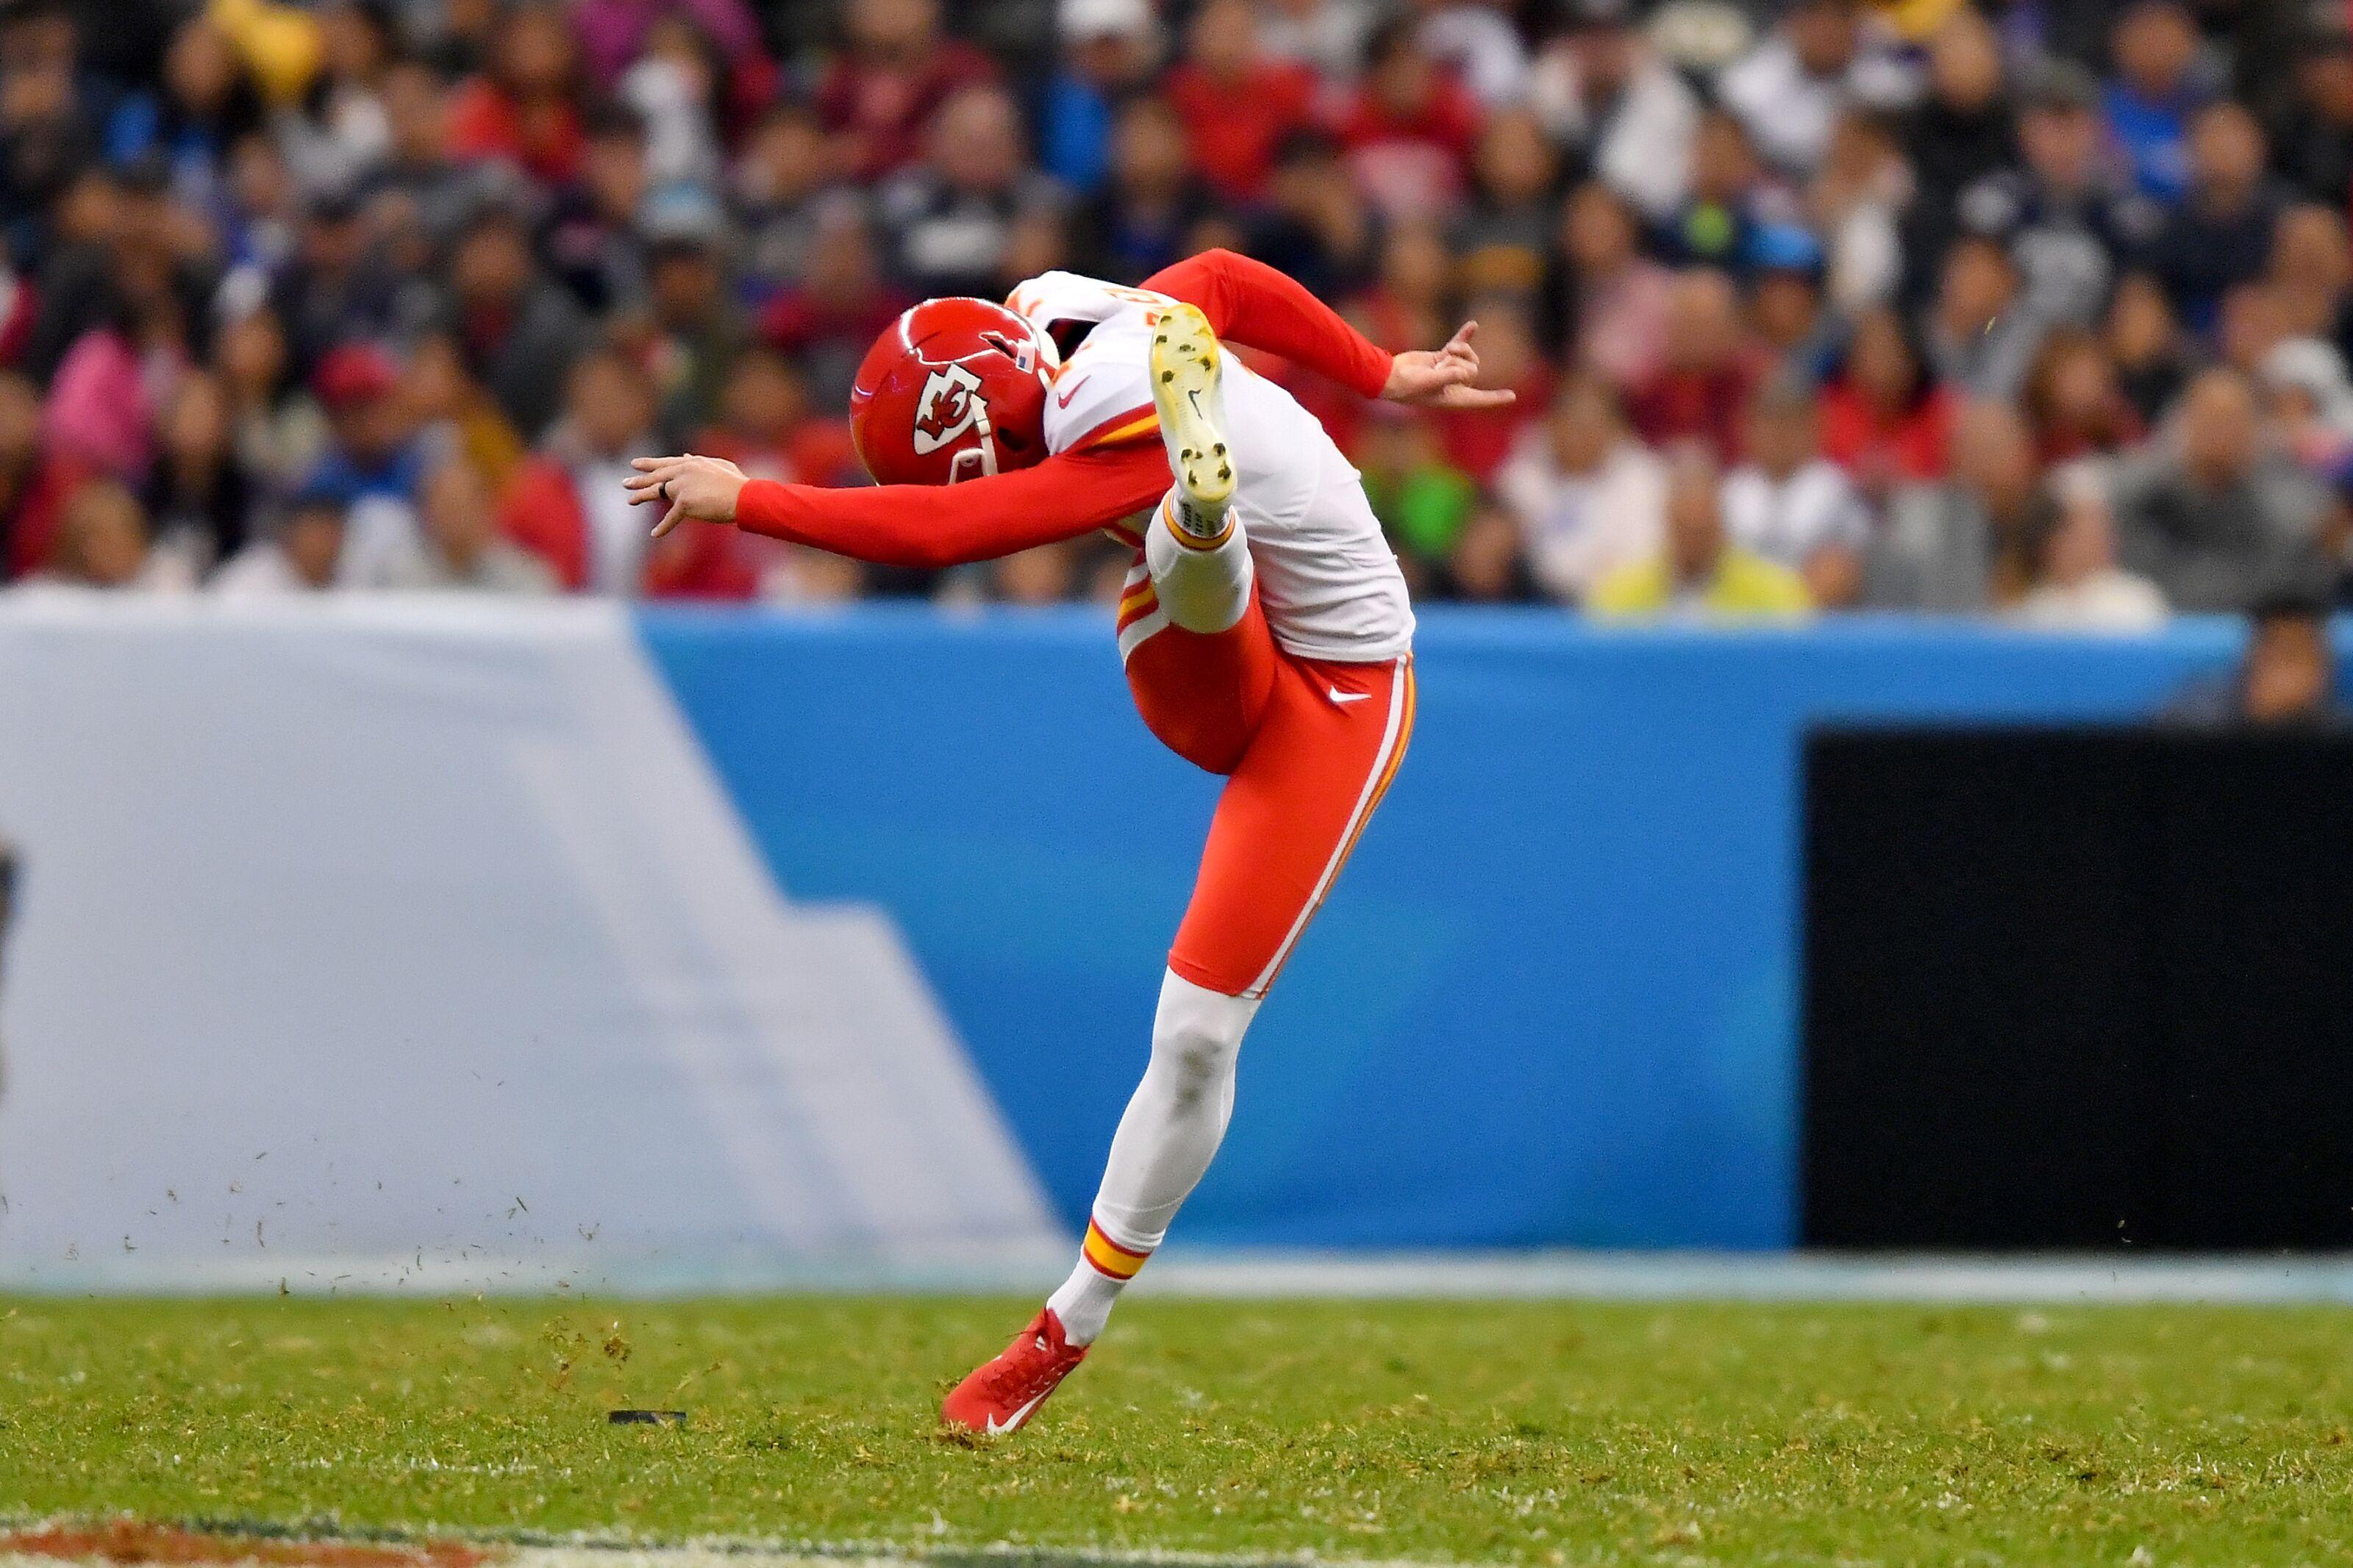 Super Bowl preview Fantasy POV: Butker gives Chiefs kicking advantage